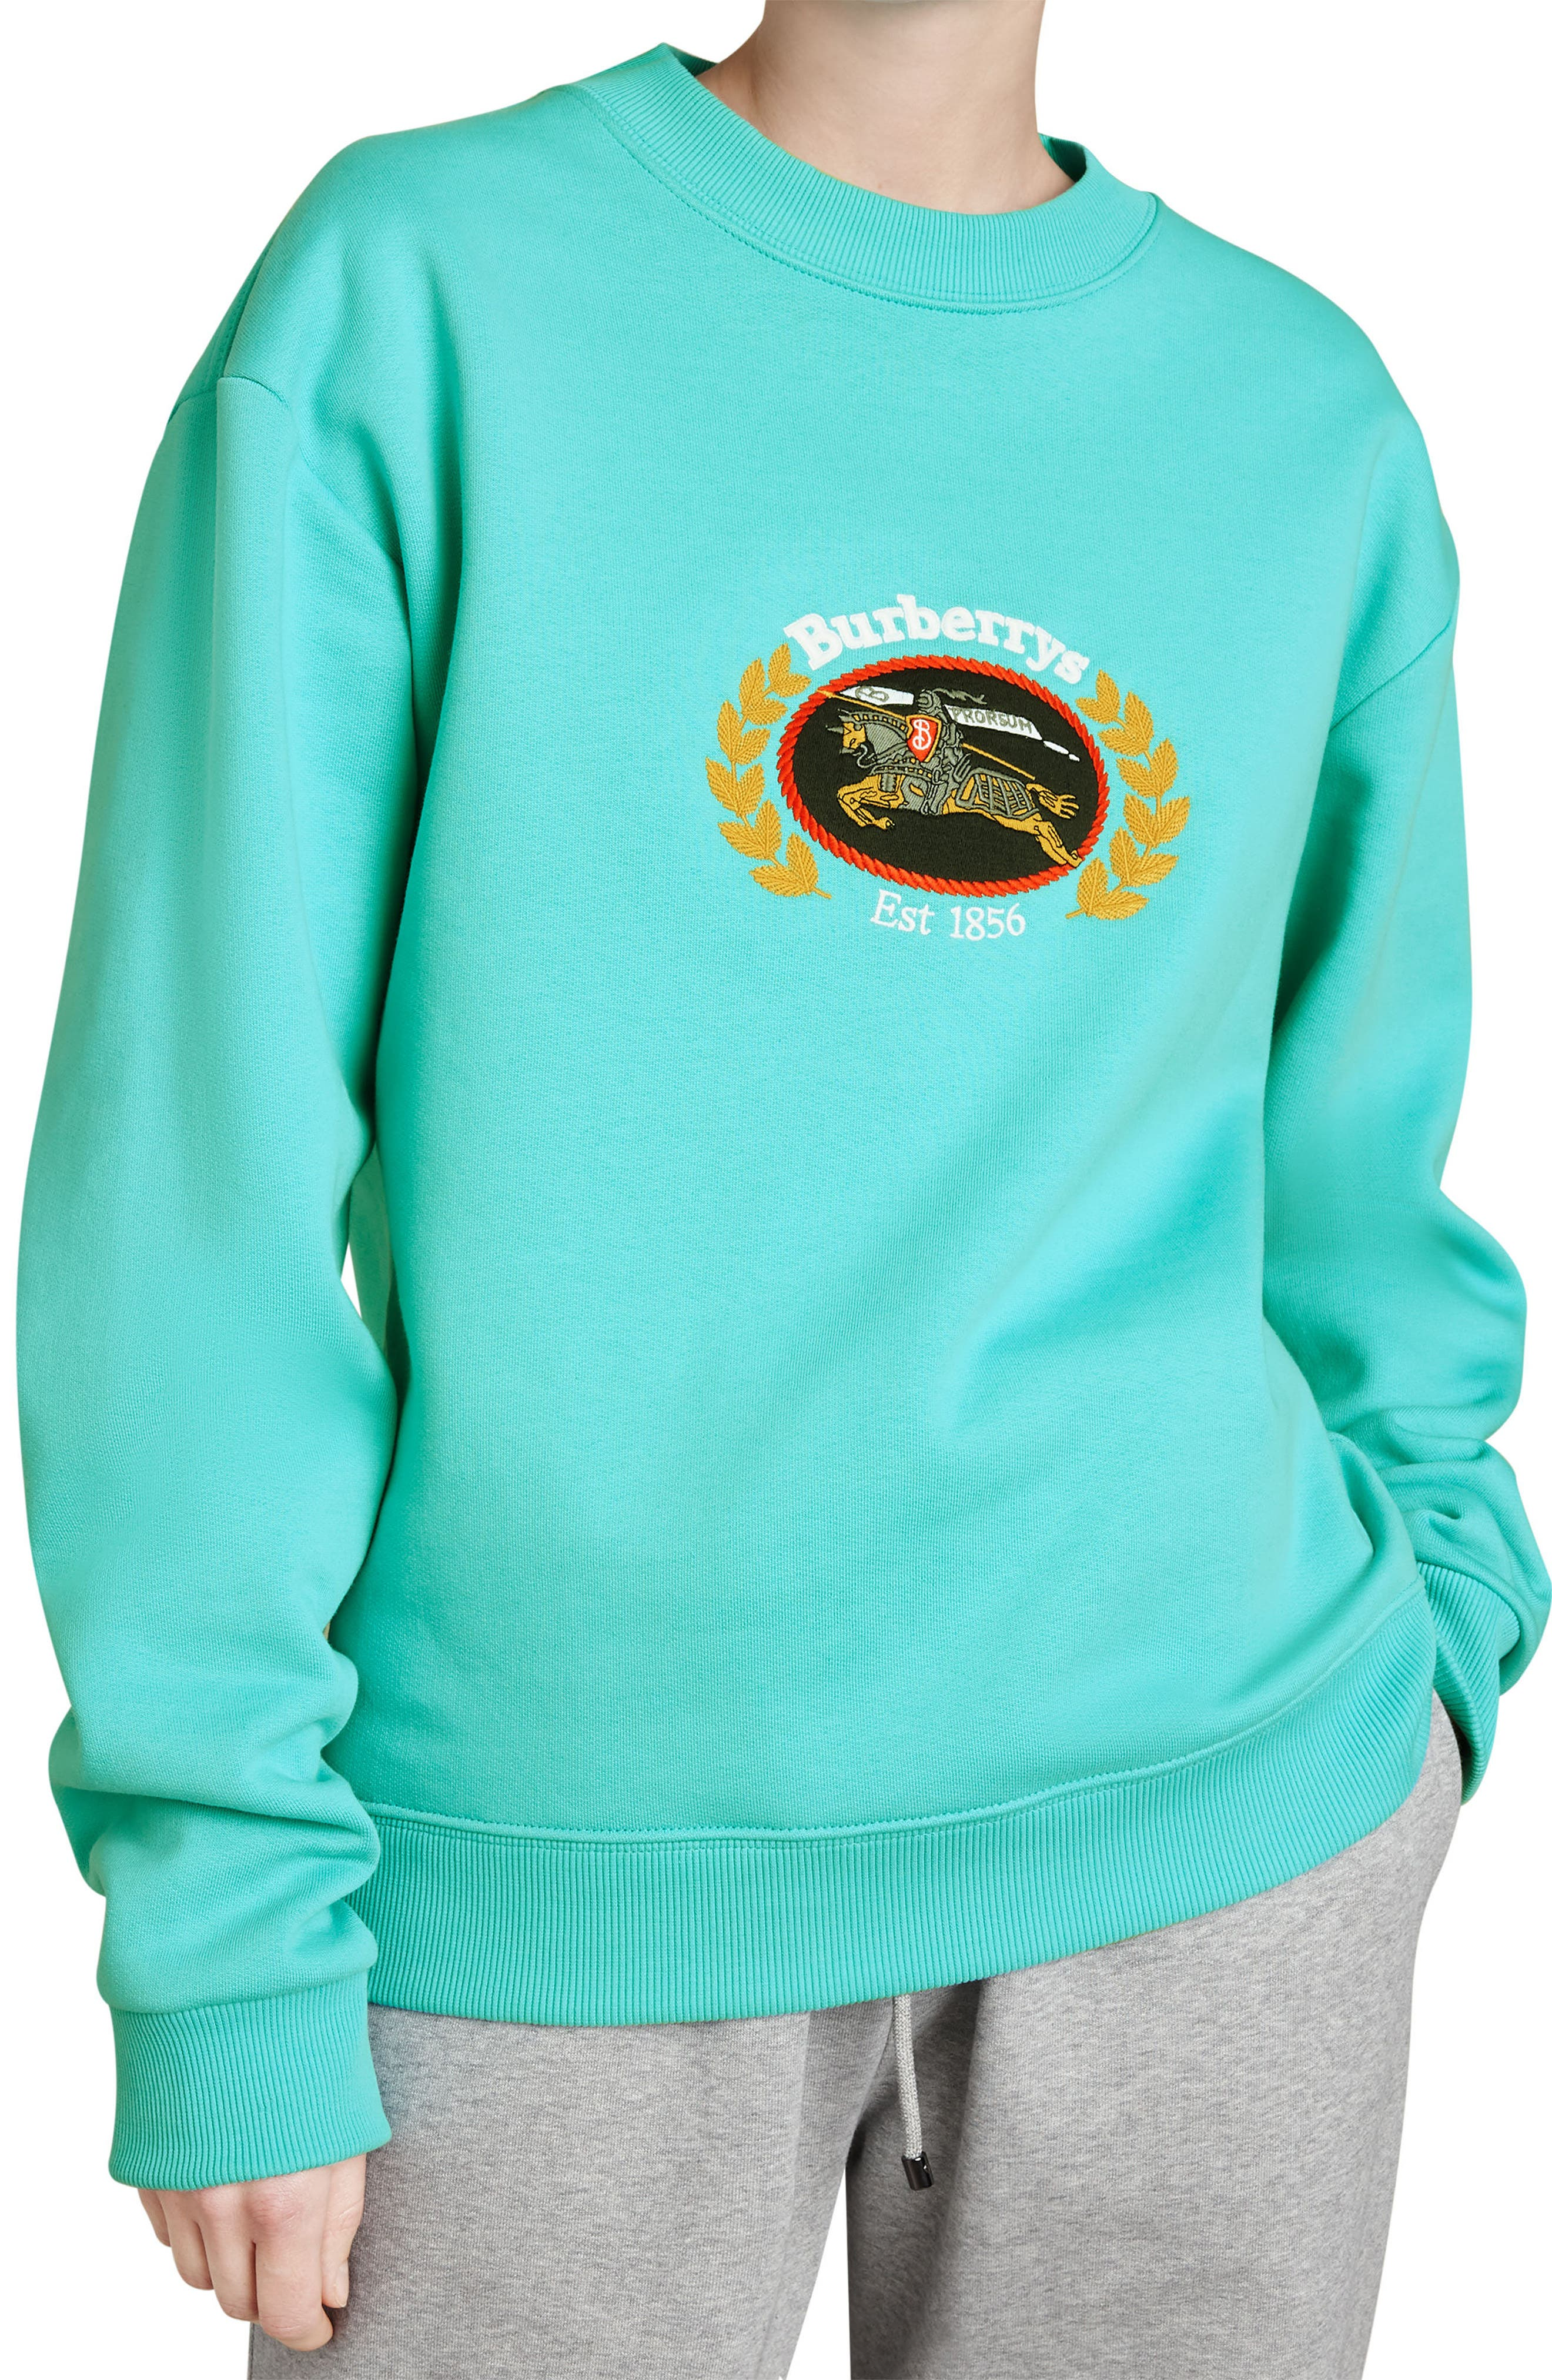 Burberry Vintage Crest Sweatshirt